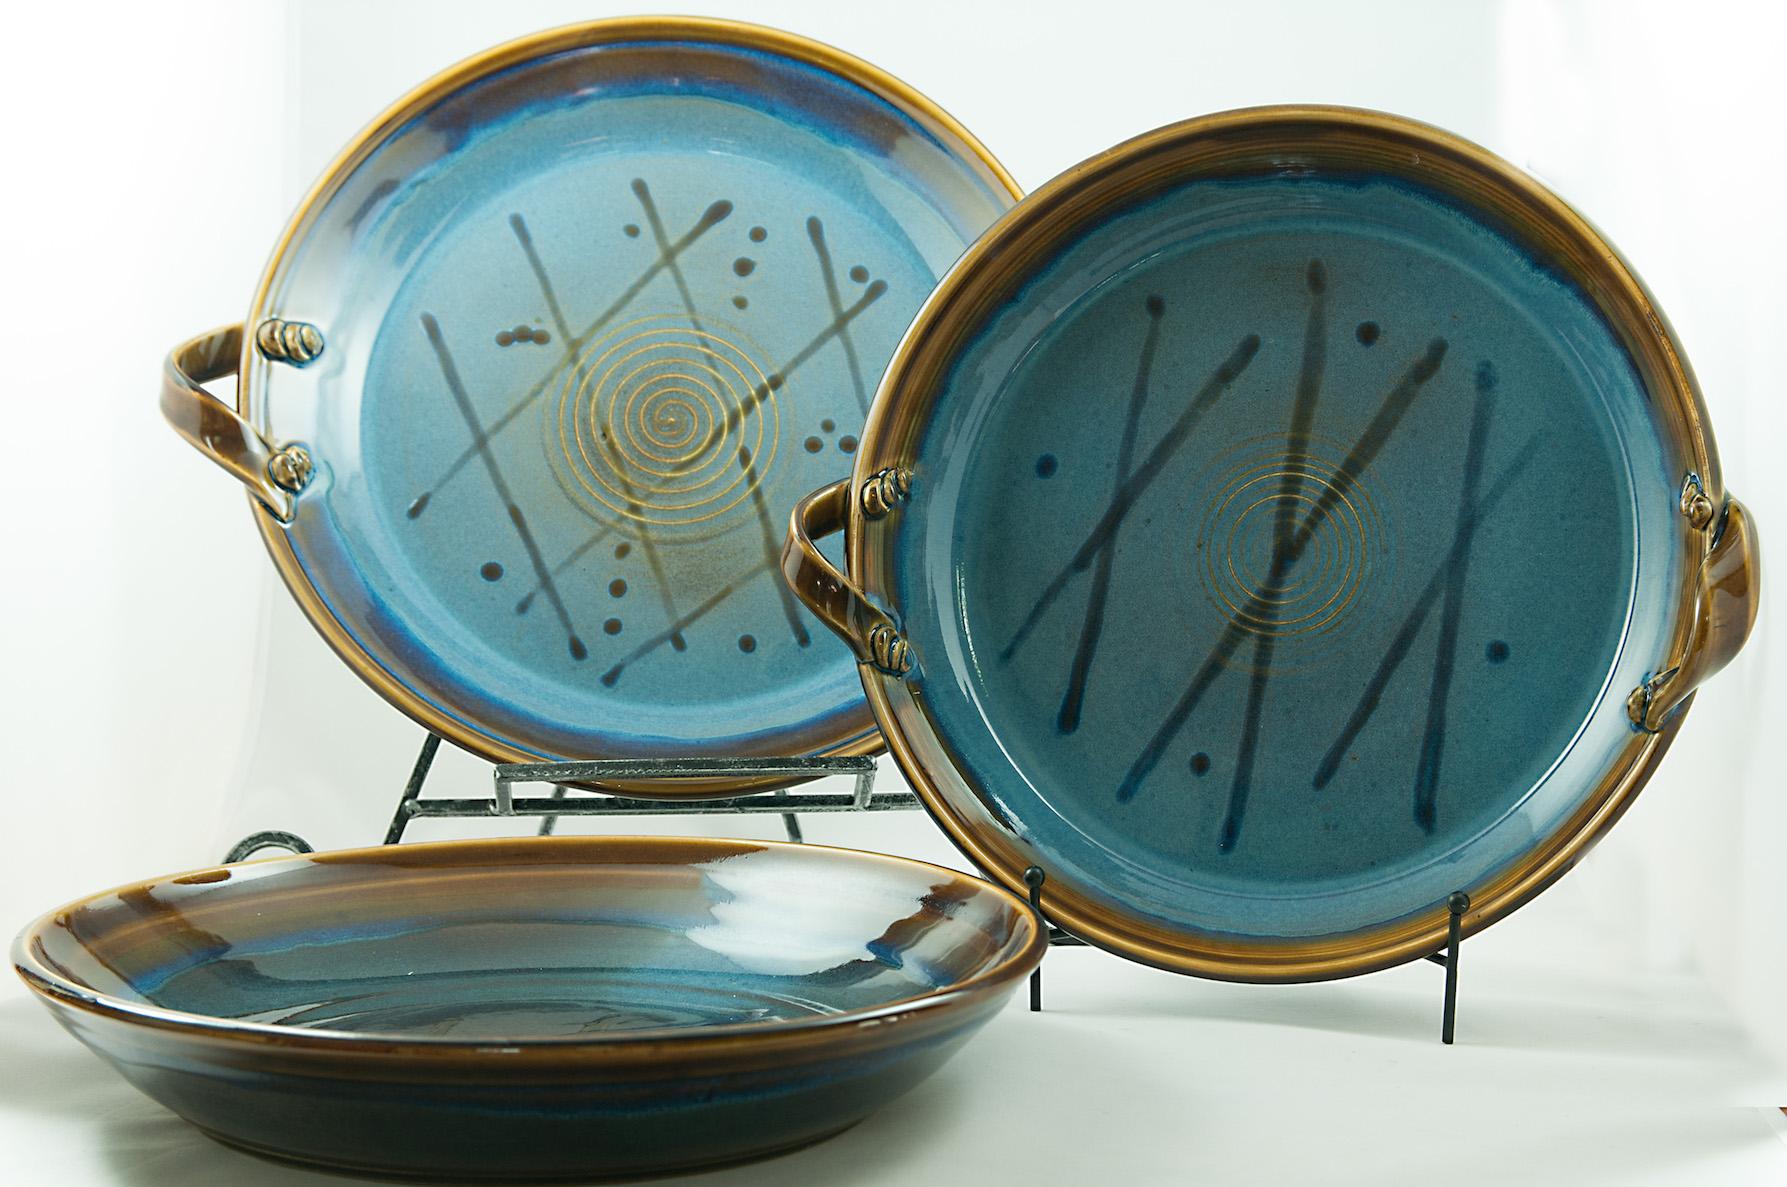 3 Platters copy.jpg